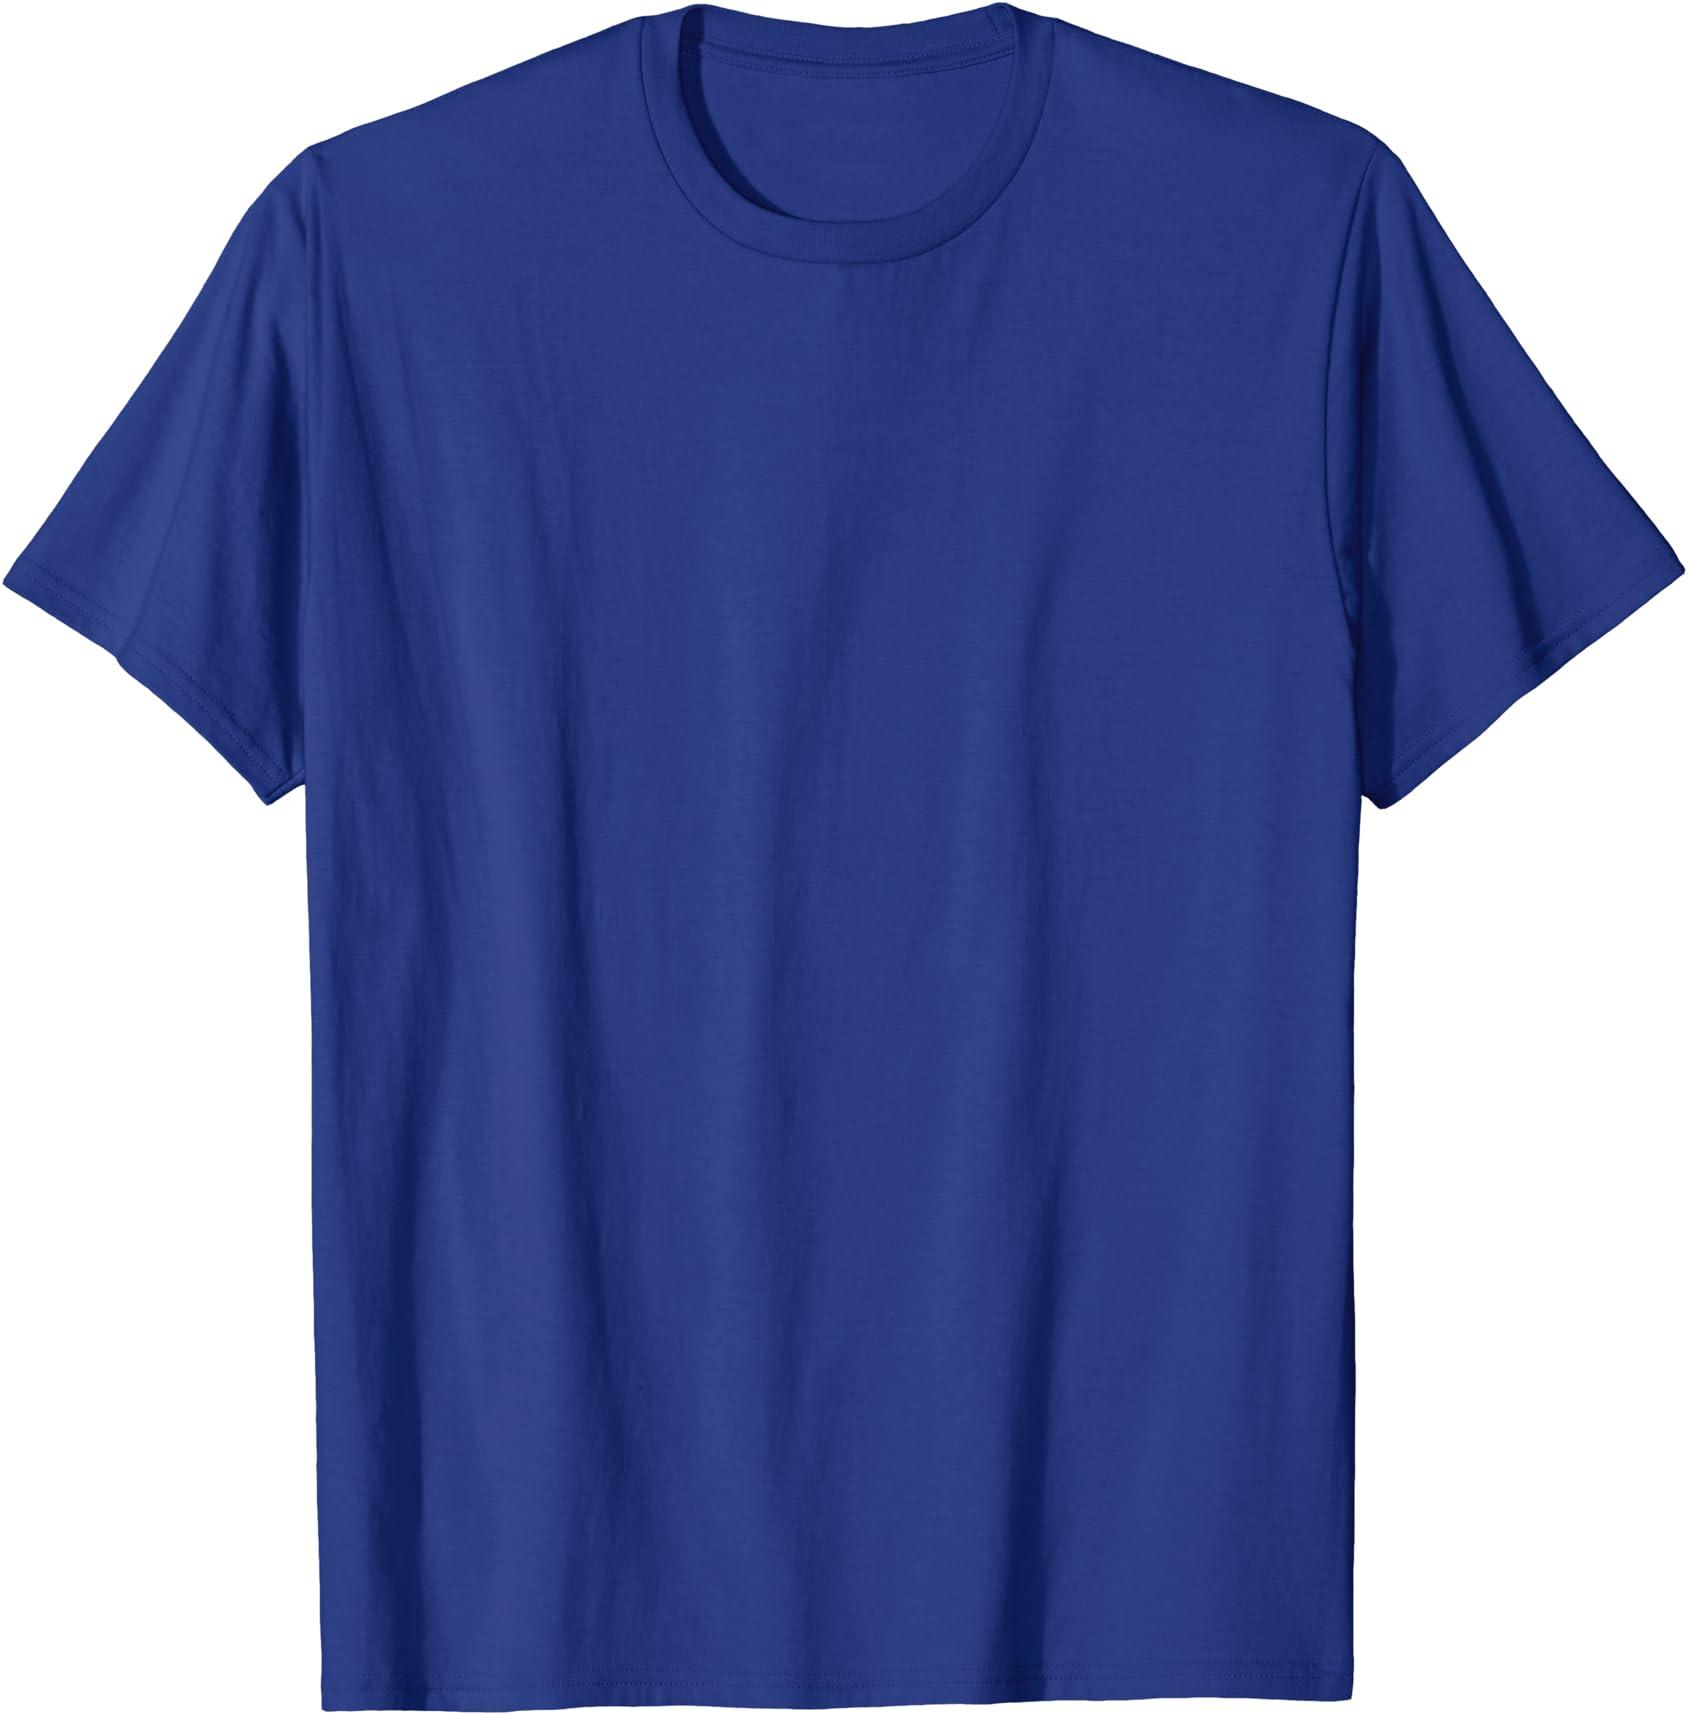 The Day the Earth Stood Still Gort Klaatu Barada Nikto T Shirt